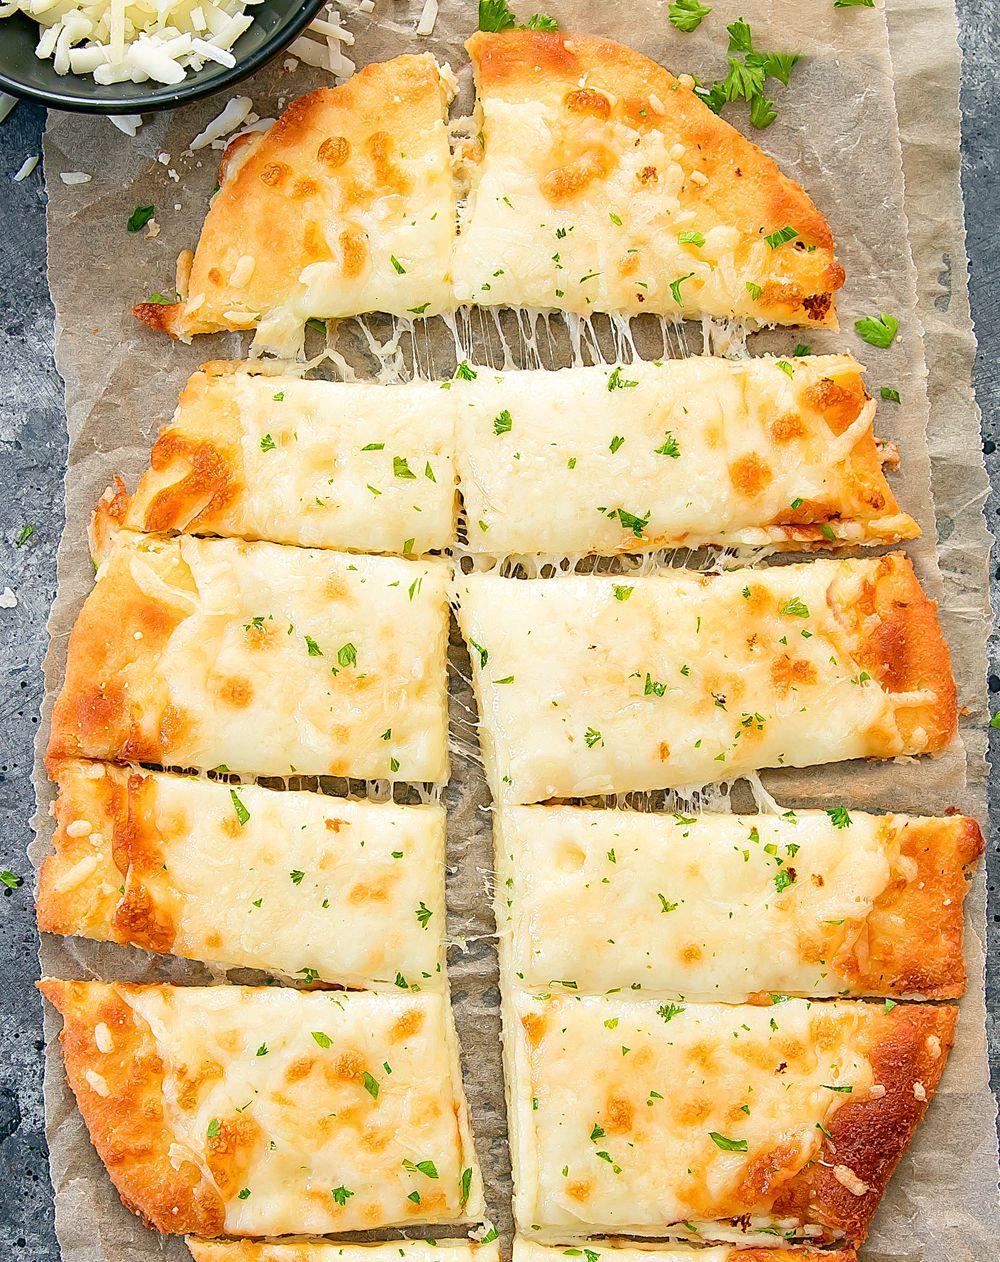 Keto Breadsticks Recipe Keto Keto Bread No Carb Diets